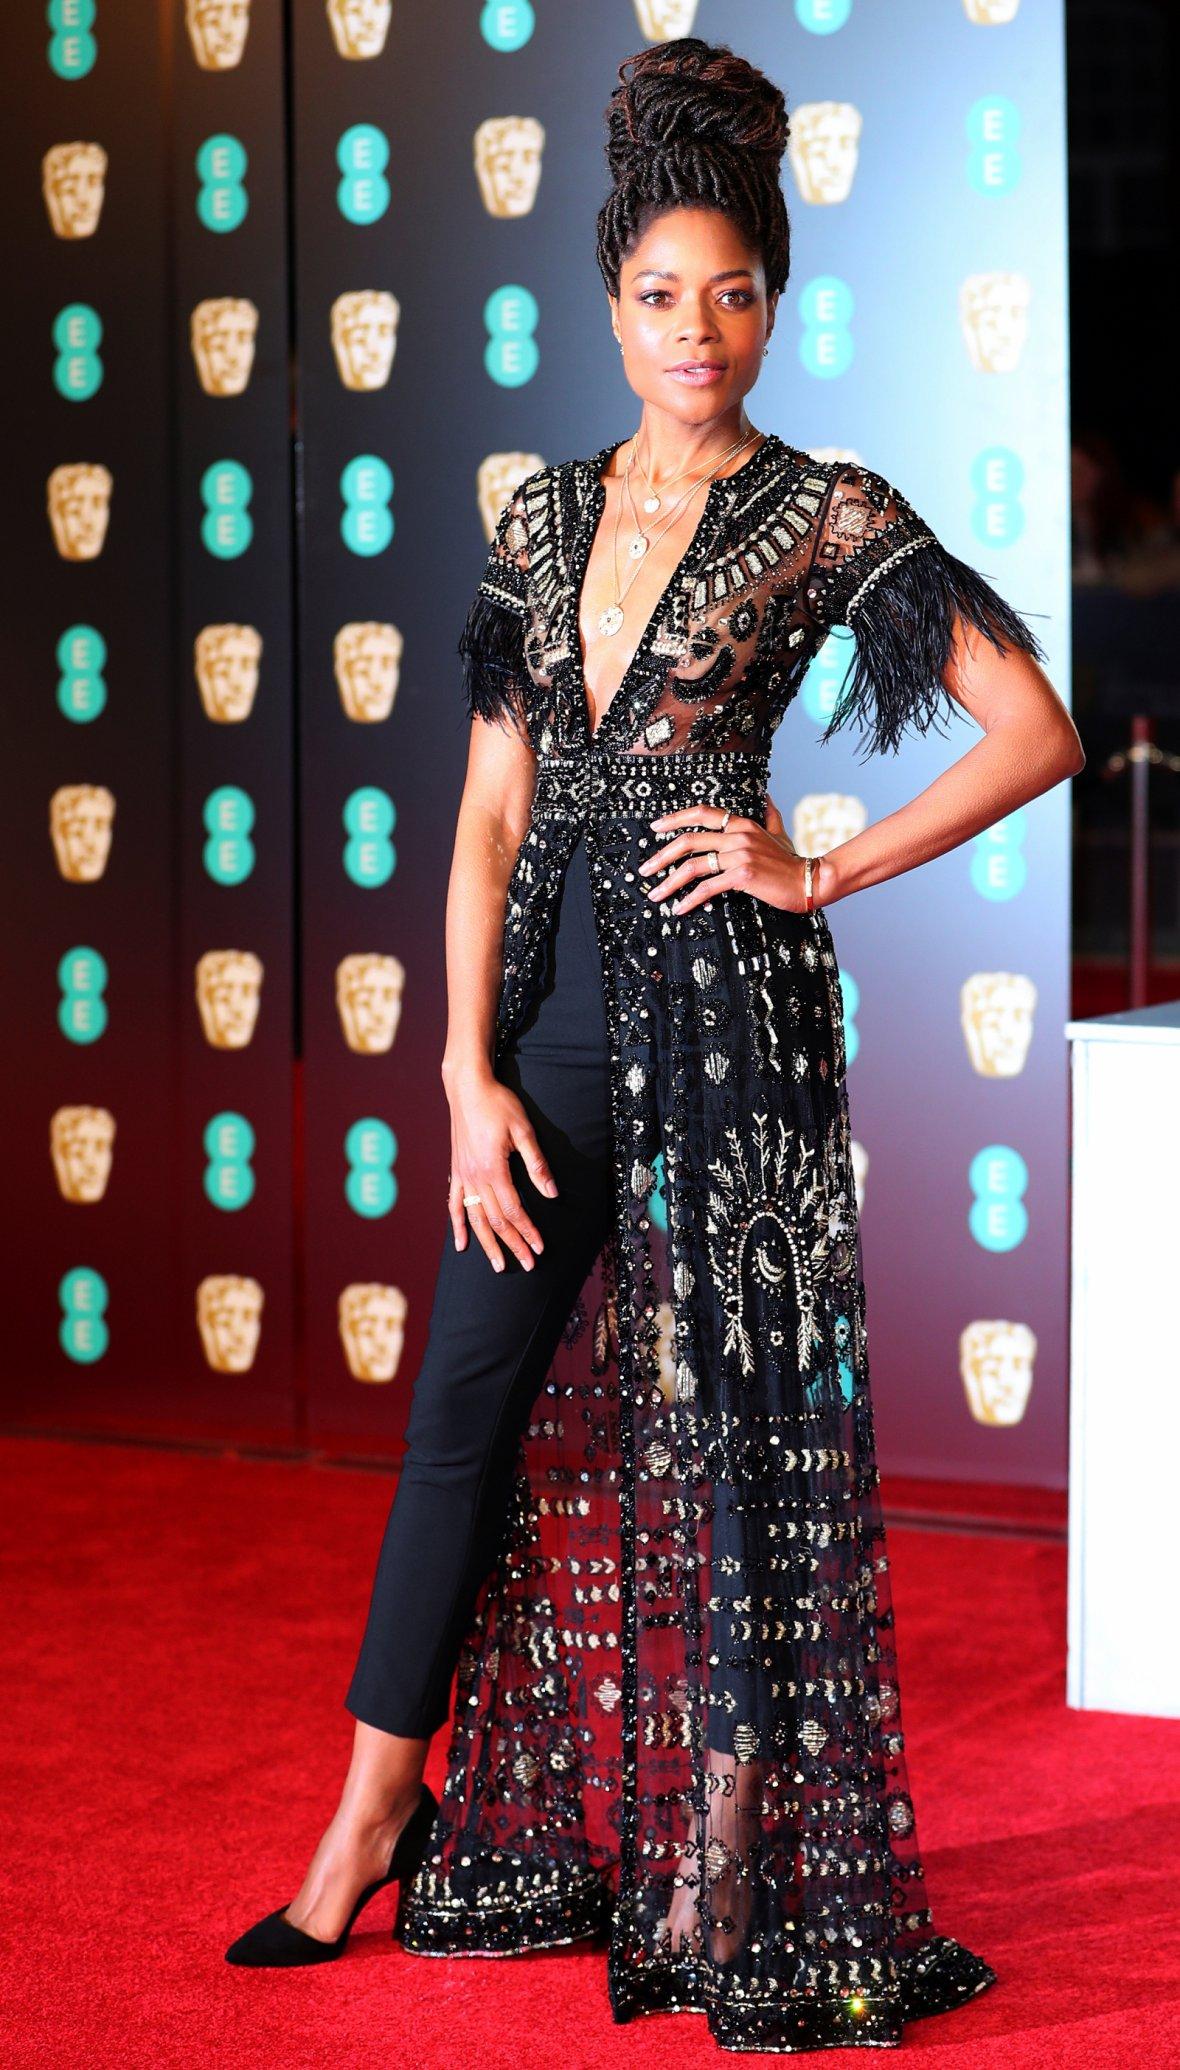 Presenter Naomi Harris poses at the British Academy of Film and Television Awards (BAFTA)